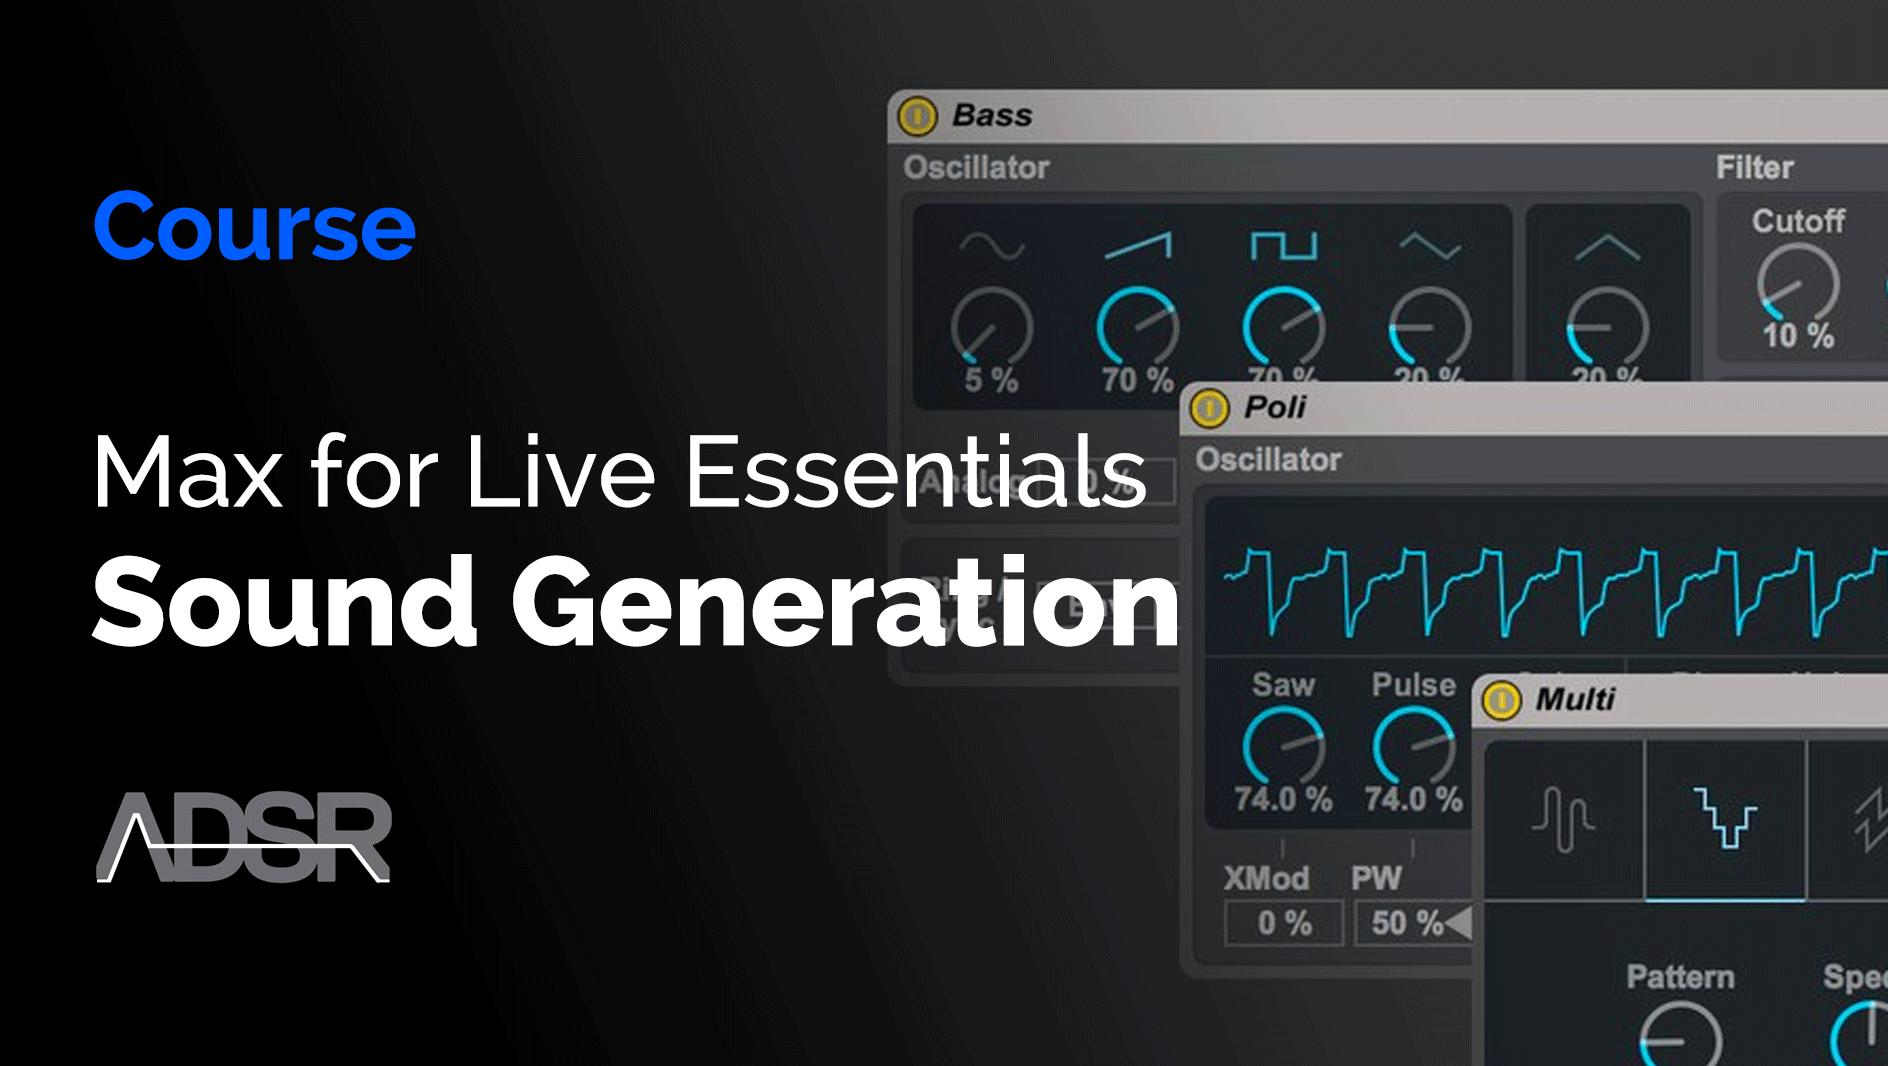 Max for Live Essentials - Sound Generation